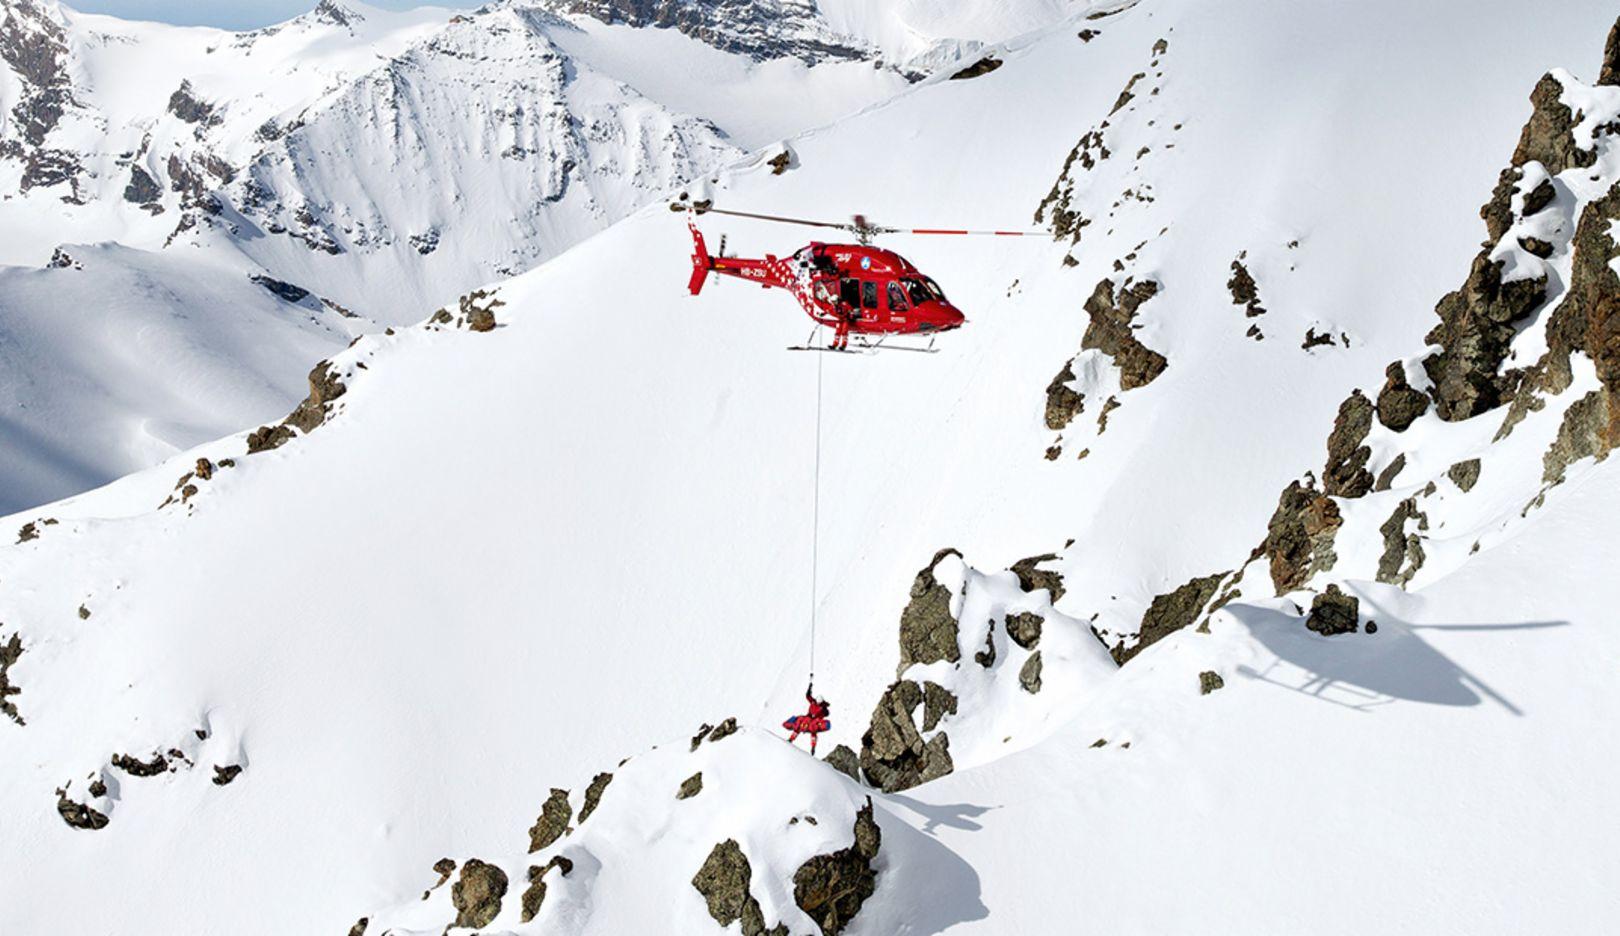 Air Zermatt's rescue helicopter at Swiss Matterhorn (Photo: Christoph Bauer)